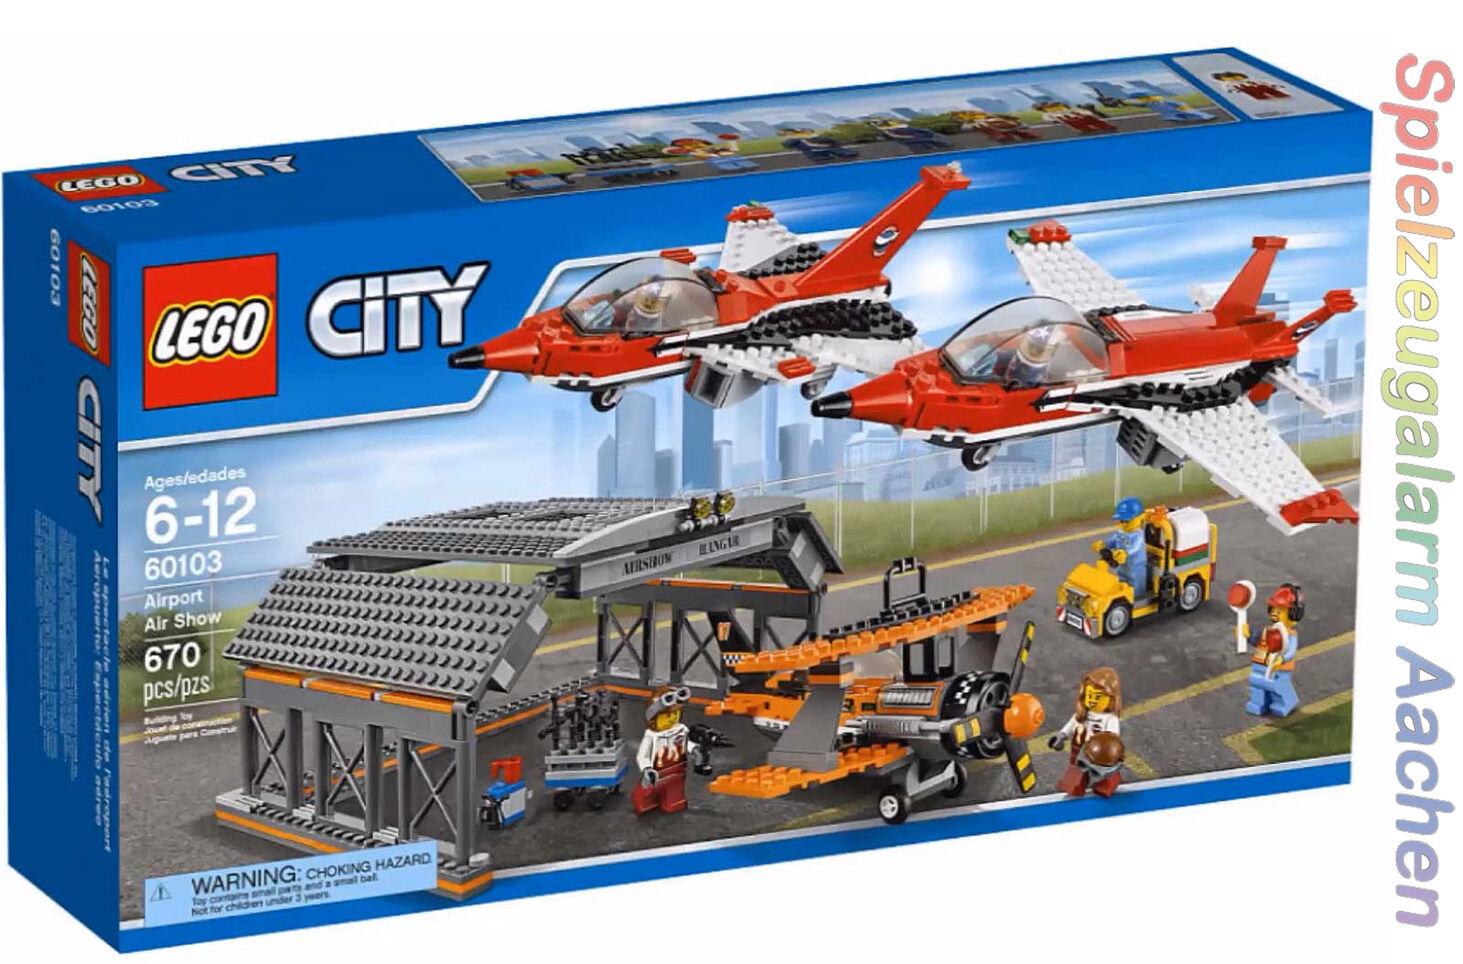 LEGO 60103 City grande volo guarda Airport Air Show le spectacle aérien BINSB n16/8